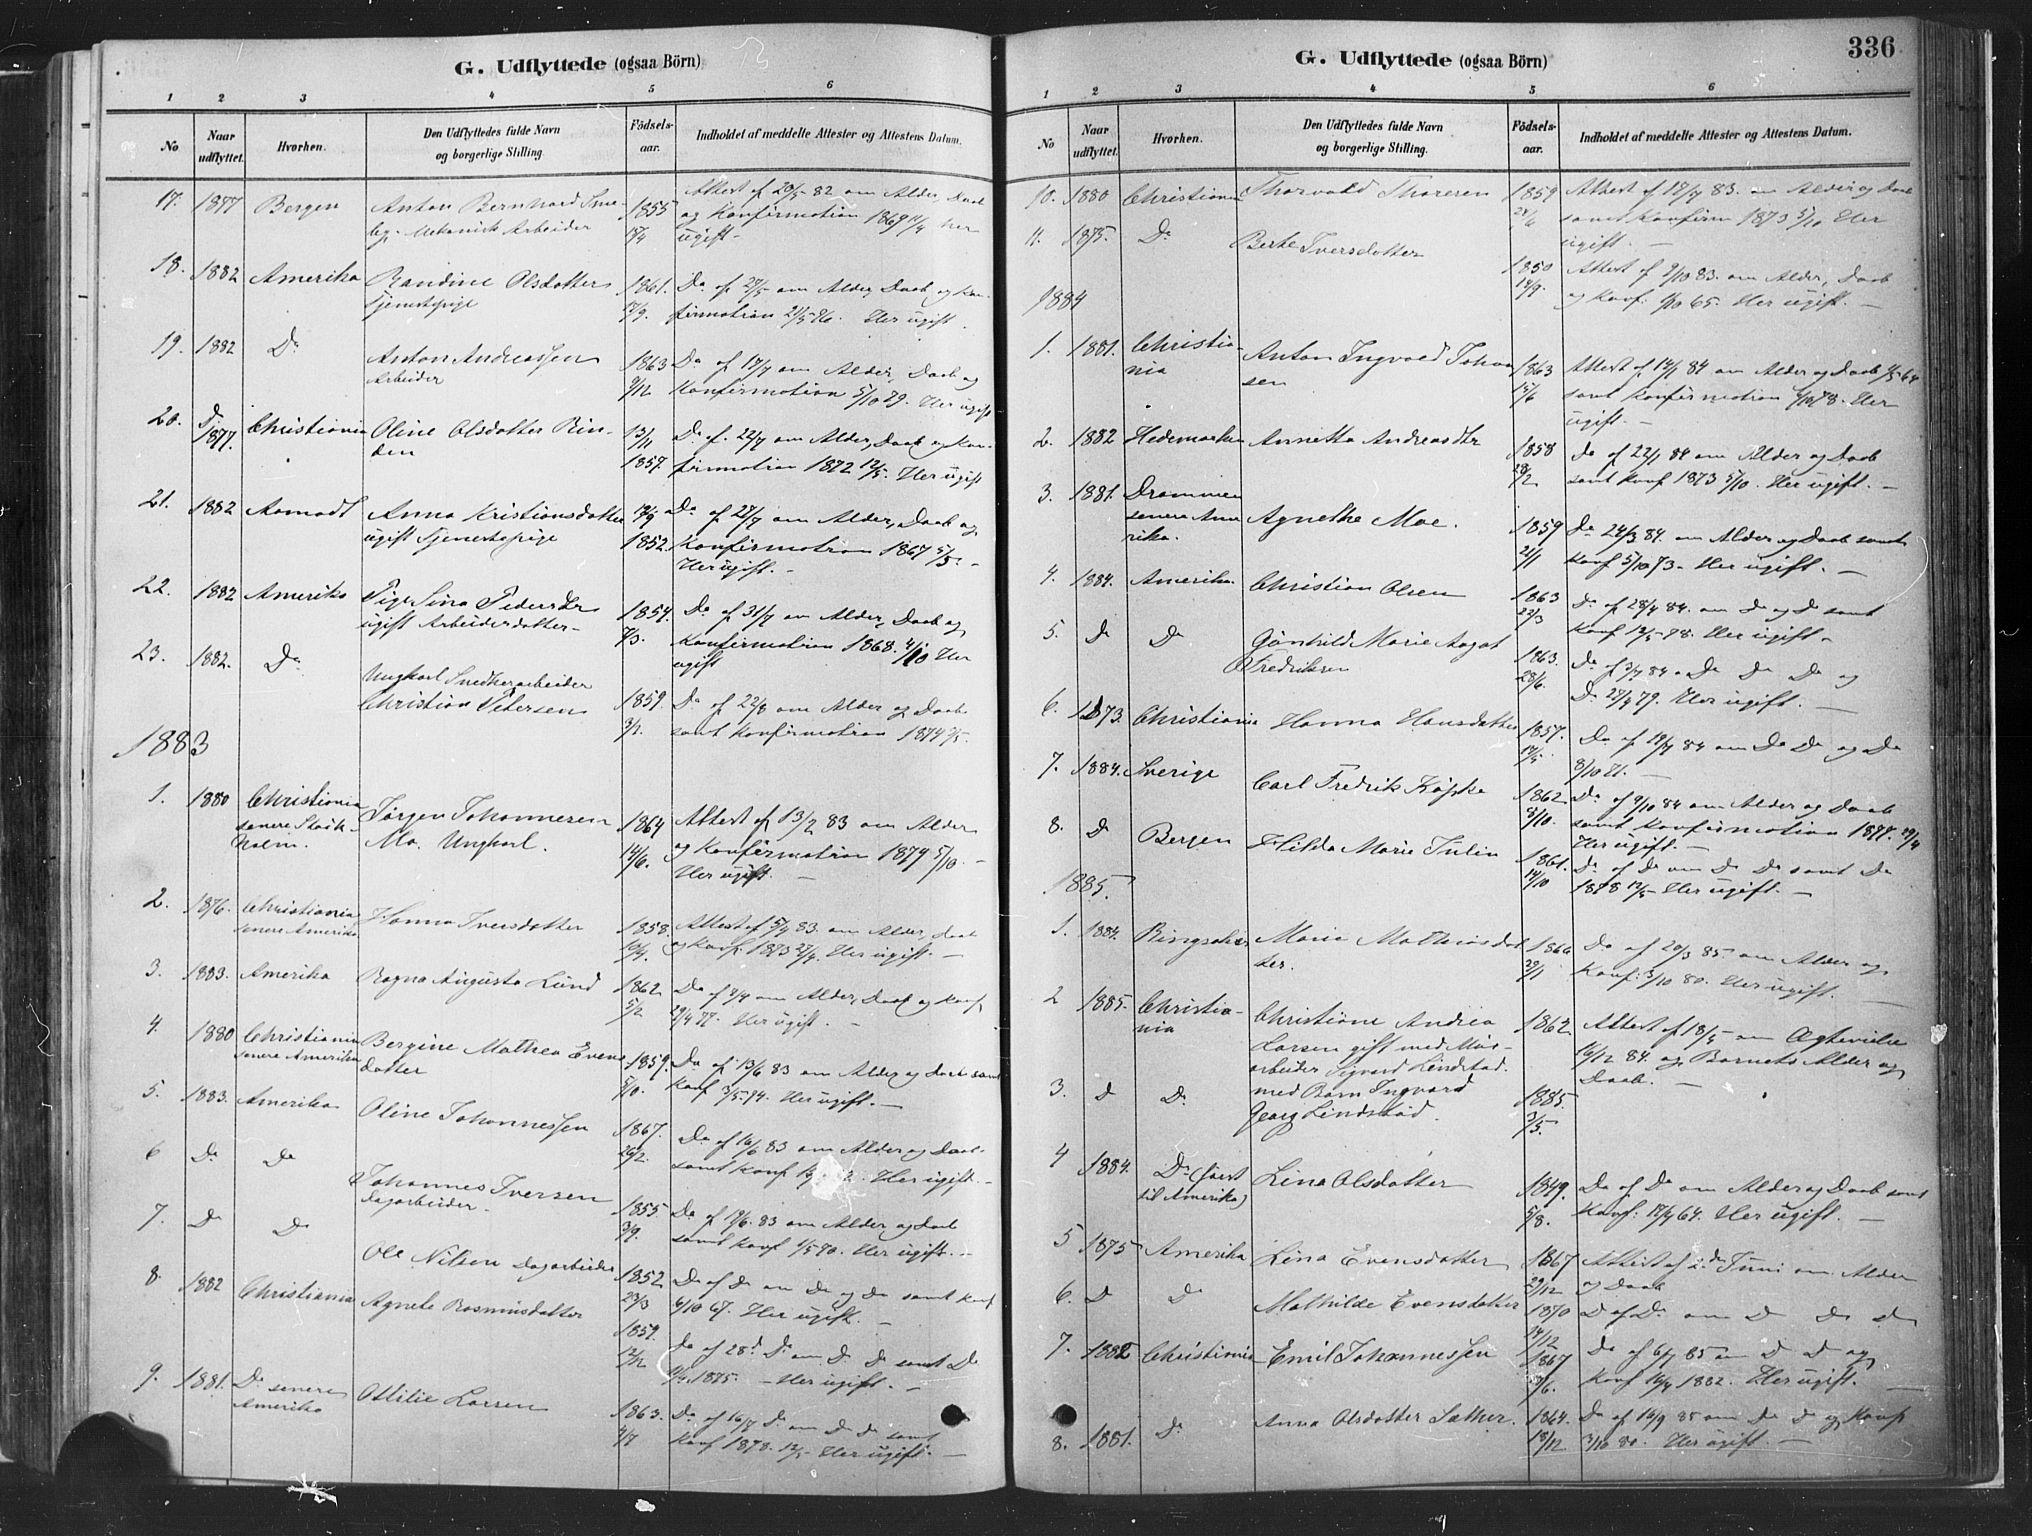 SAH, Fåberg prestekontor, Ministerialbok nr. 10, 1879-1900, s. 336